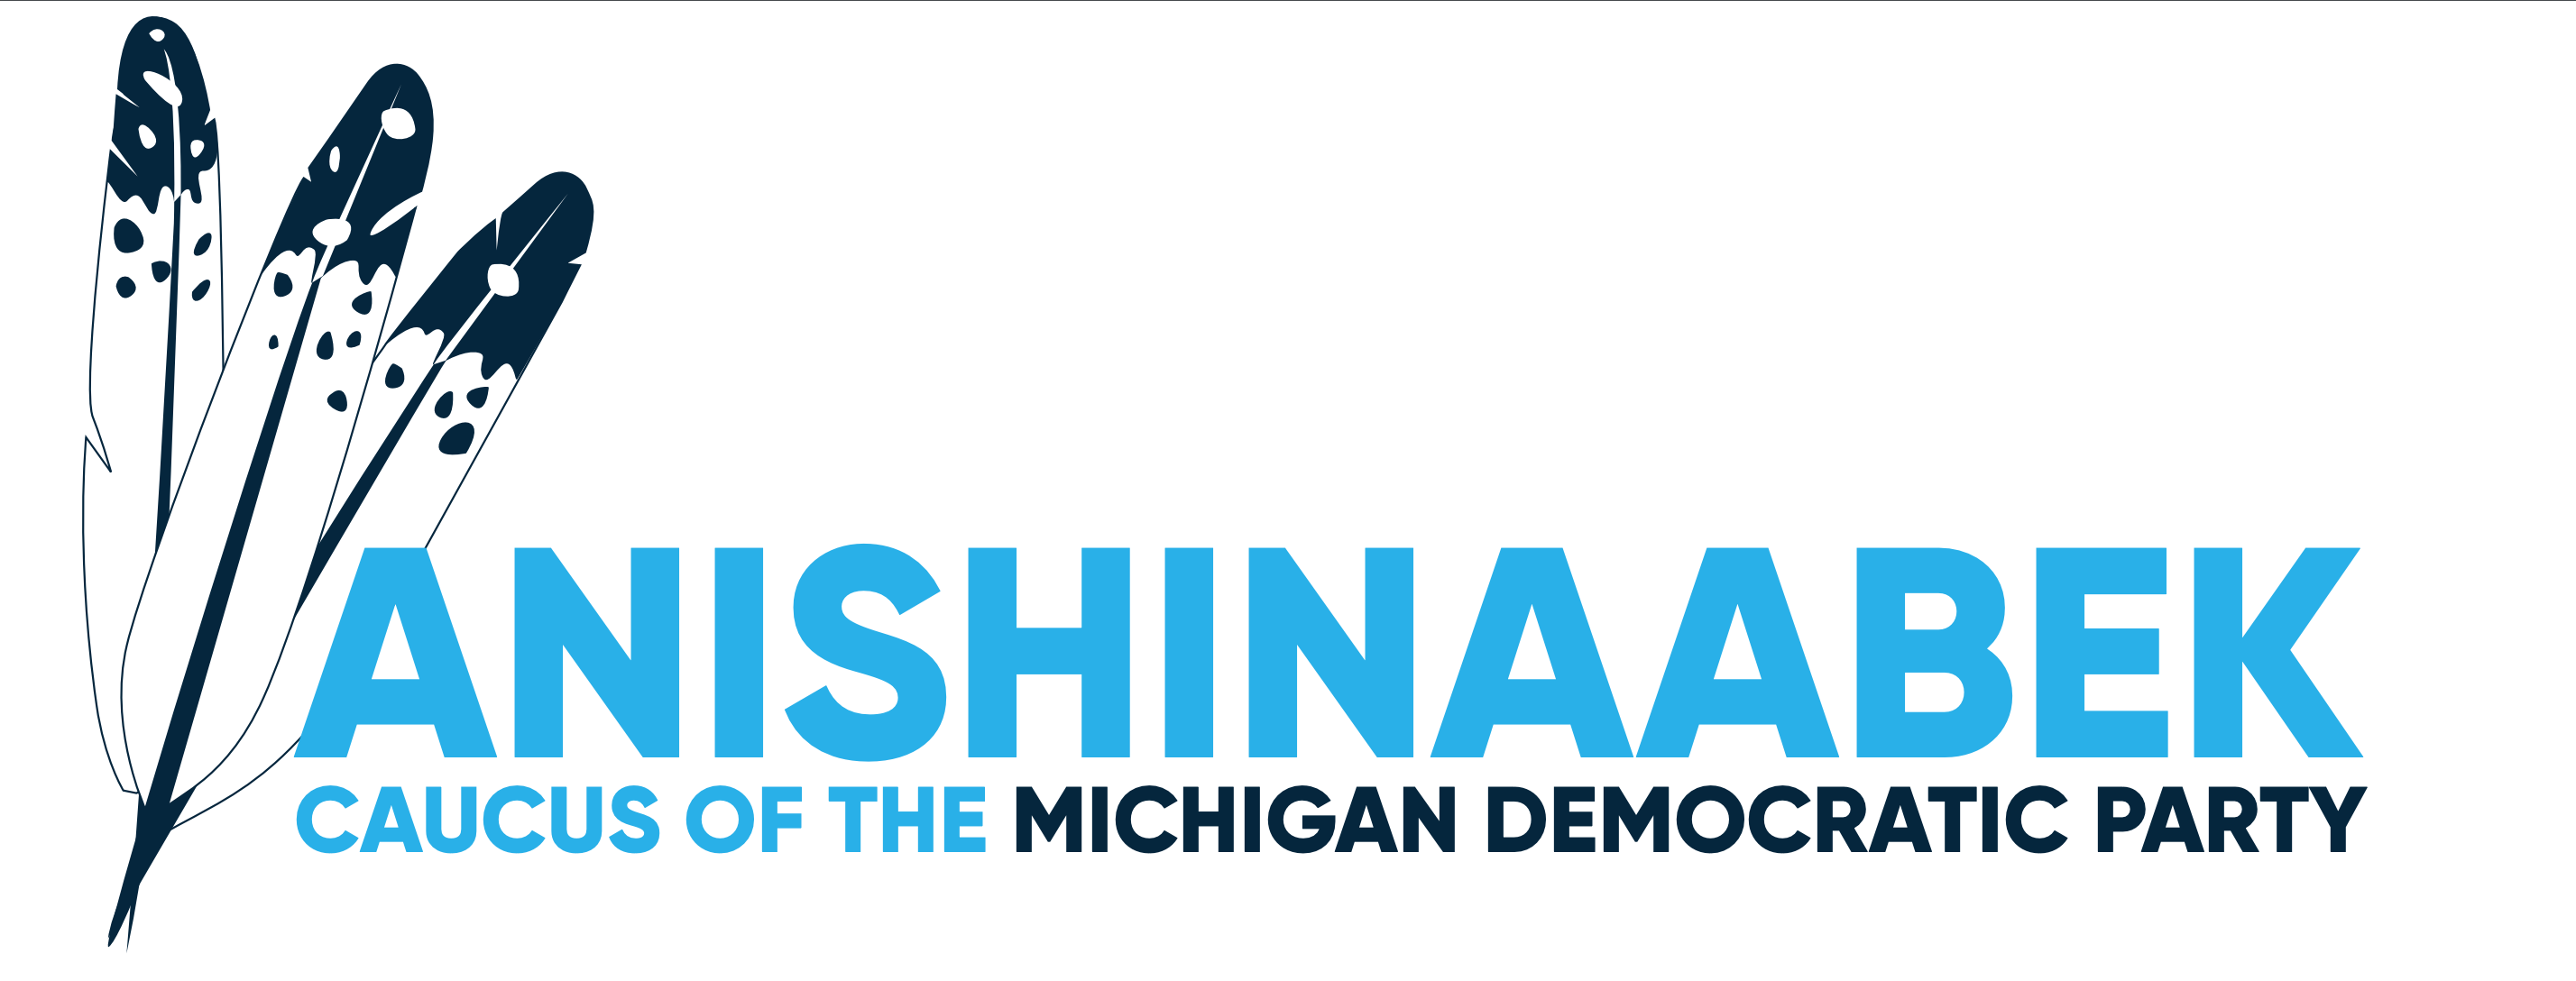 Anishinaabek Caucus of the MDP